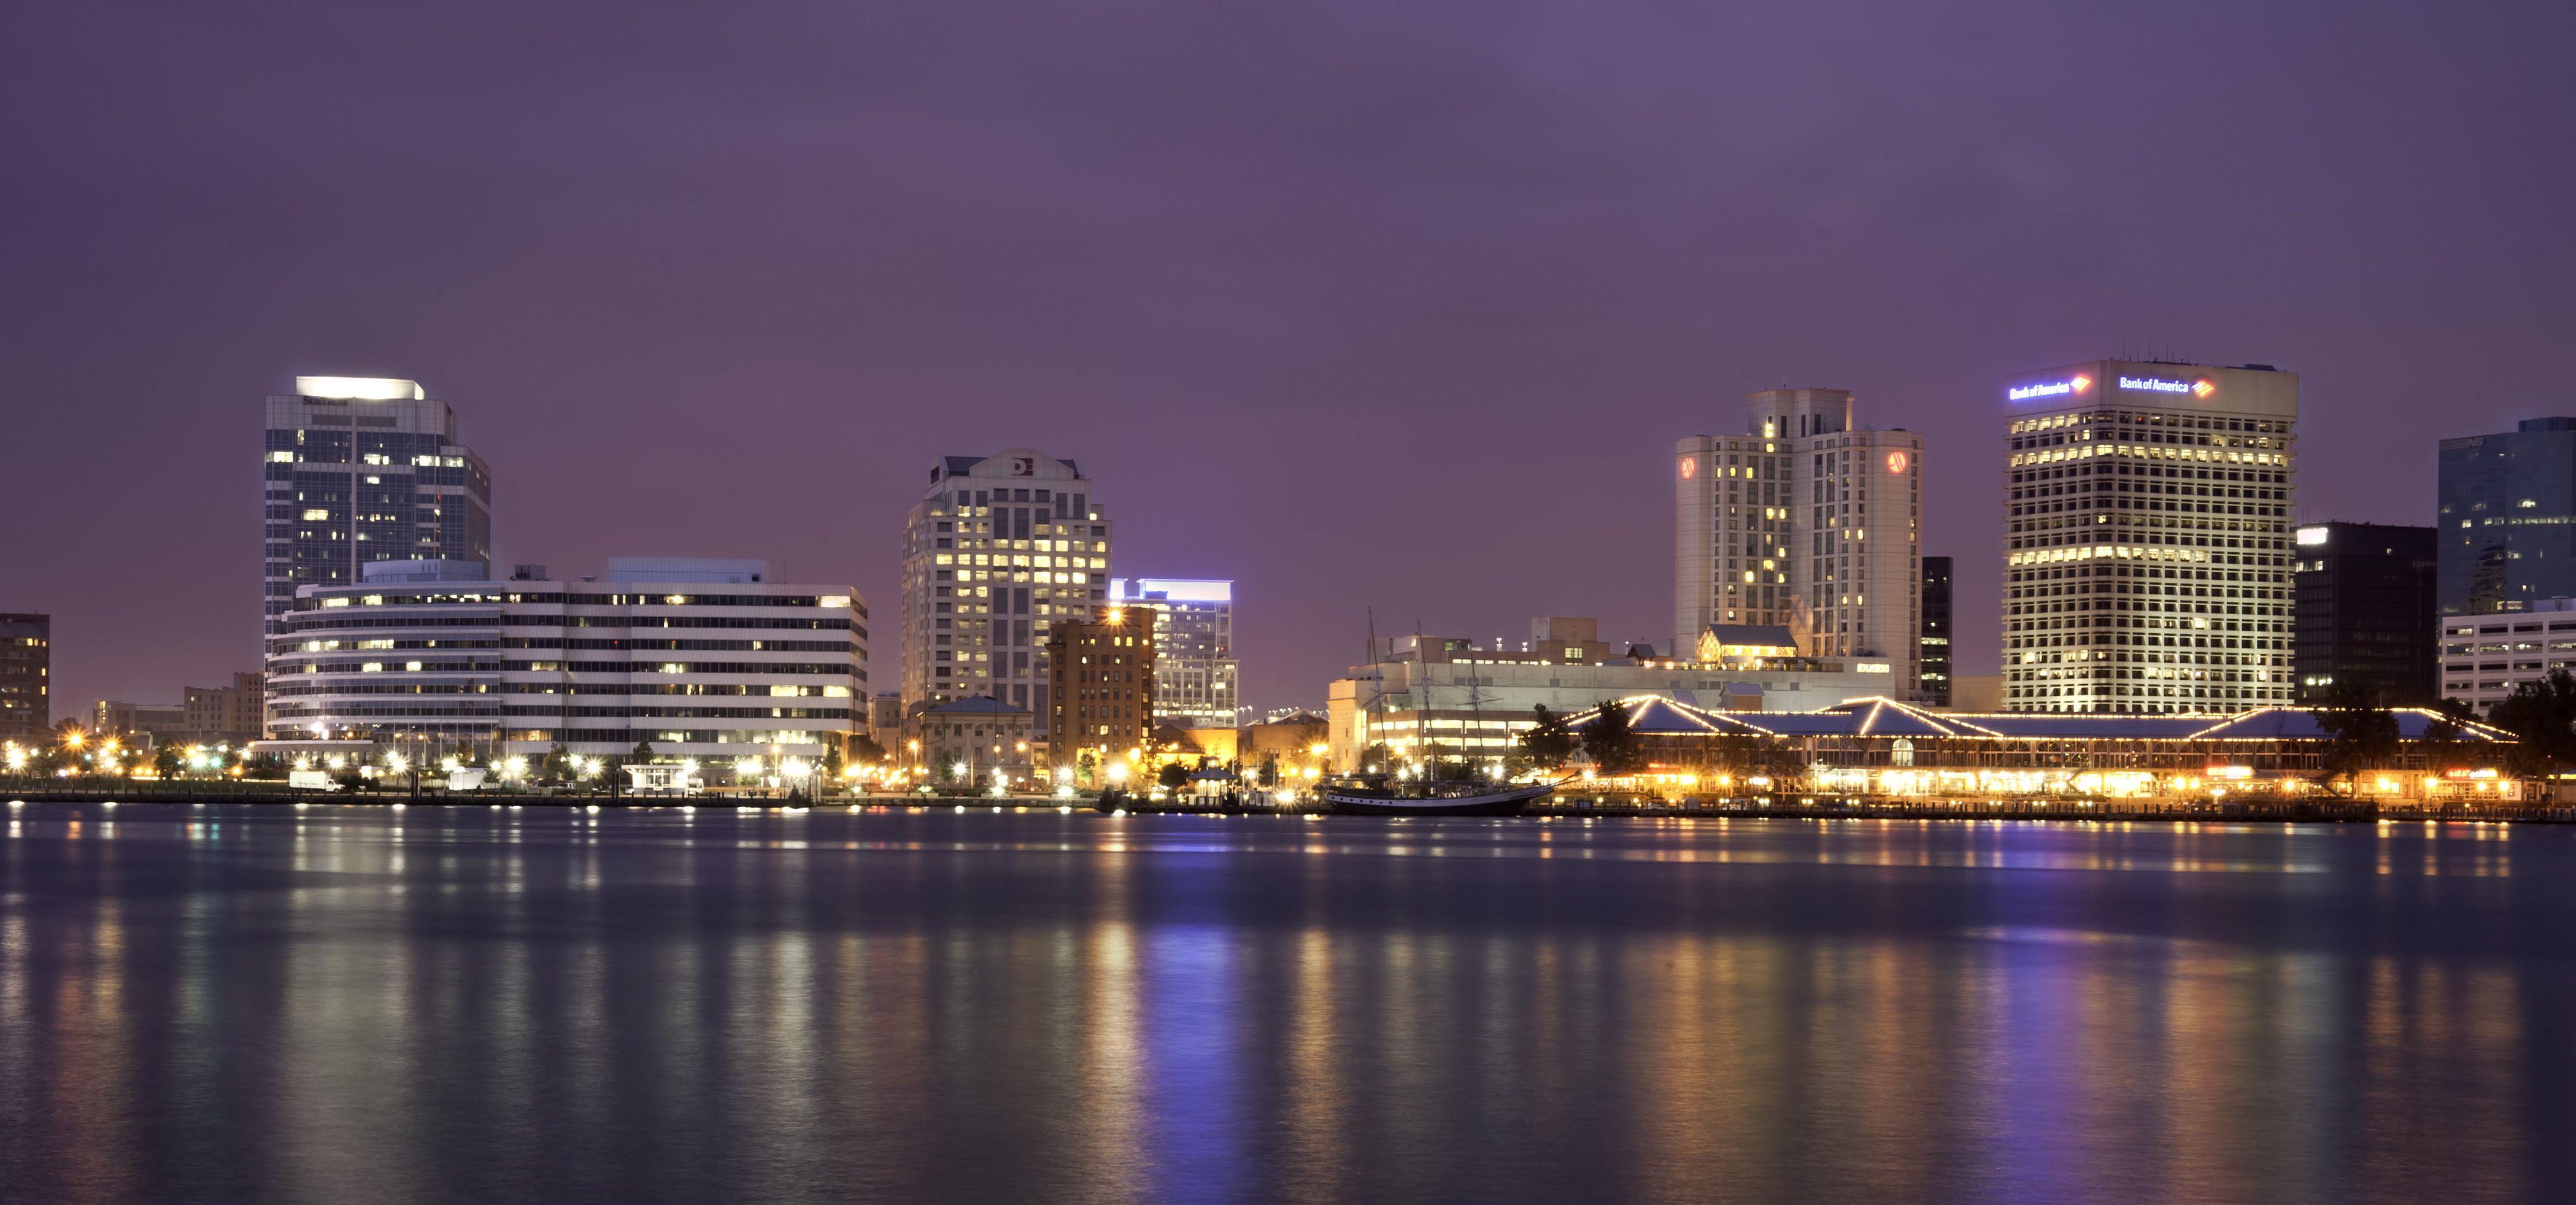 Downtown Norfolk: Downtown Norfolk, VA Waterfront